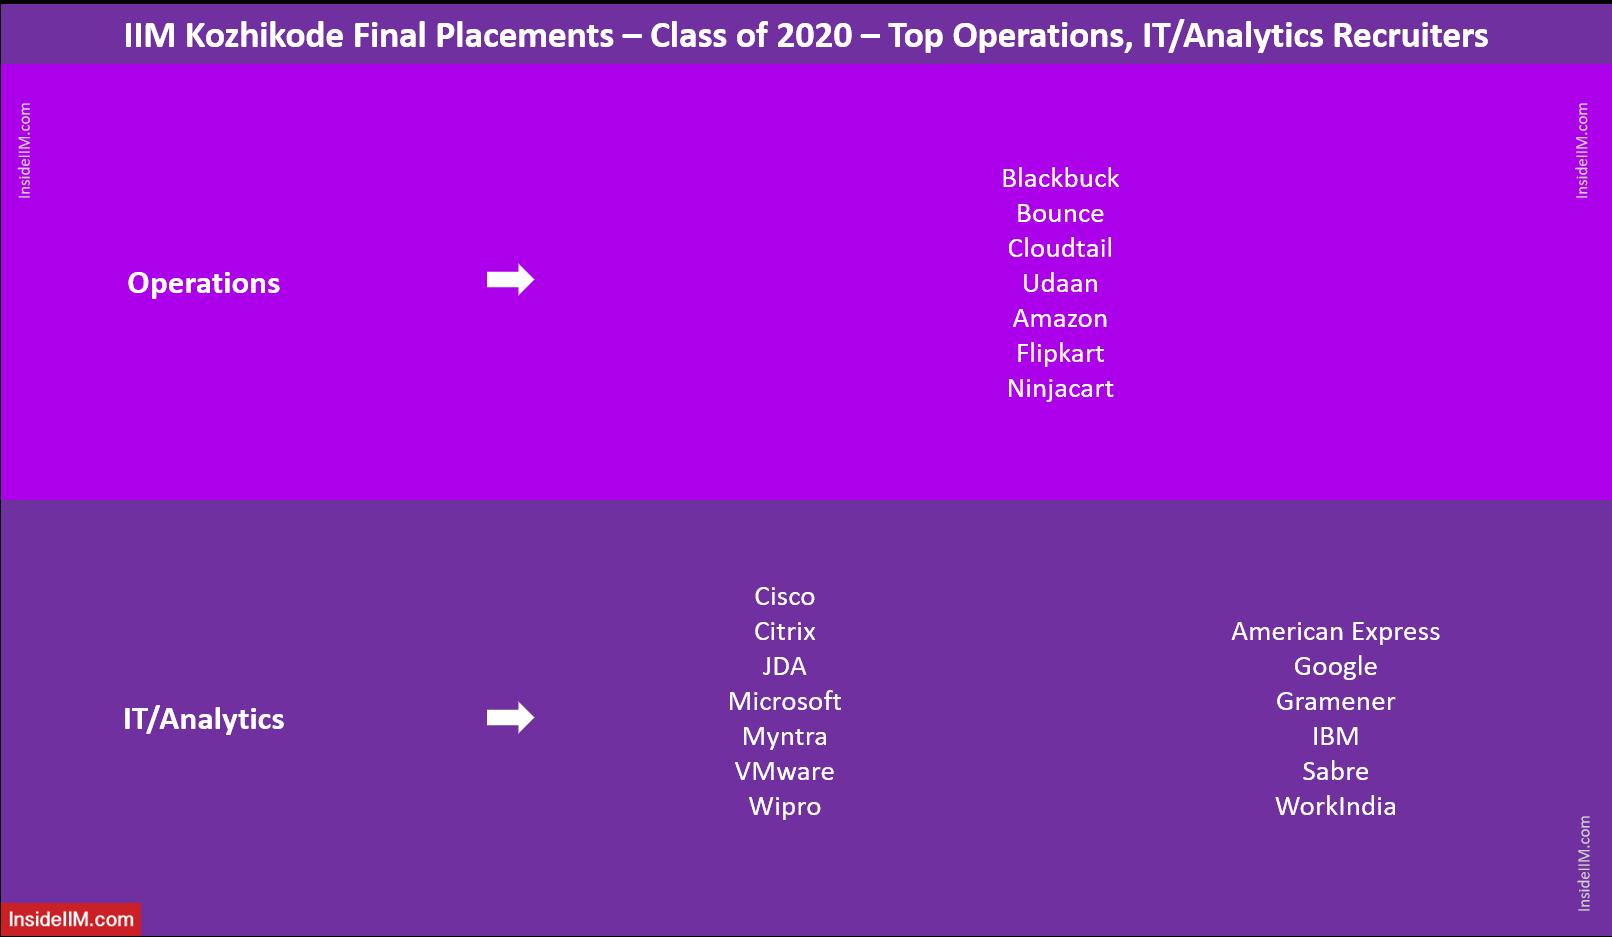 IIM Kozhikode Final Placements 2020 - Top Operations, IT/Analytics Recruiters